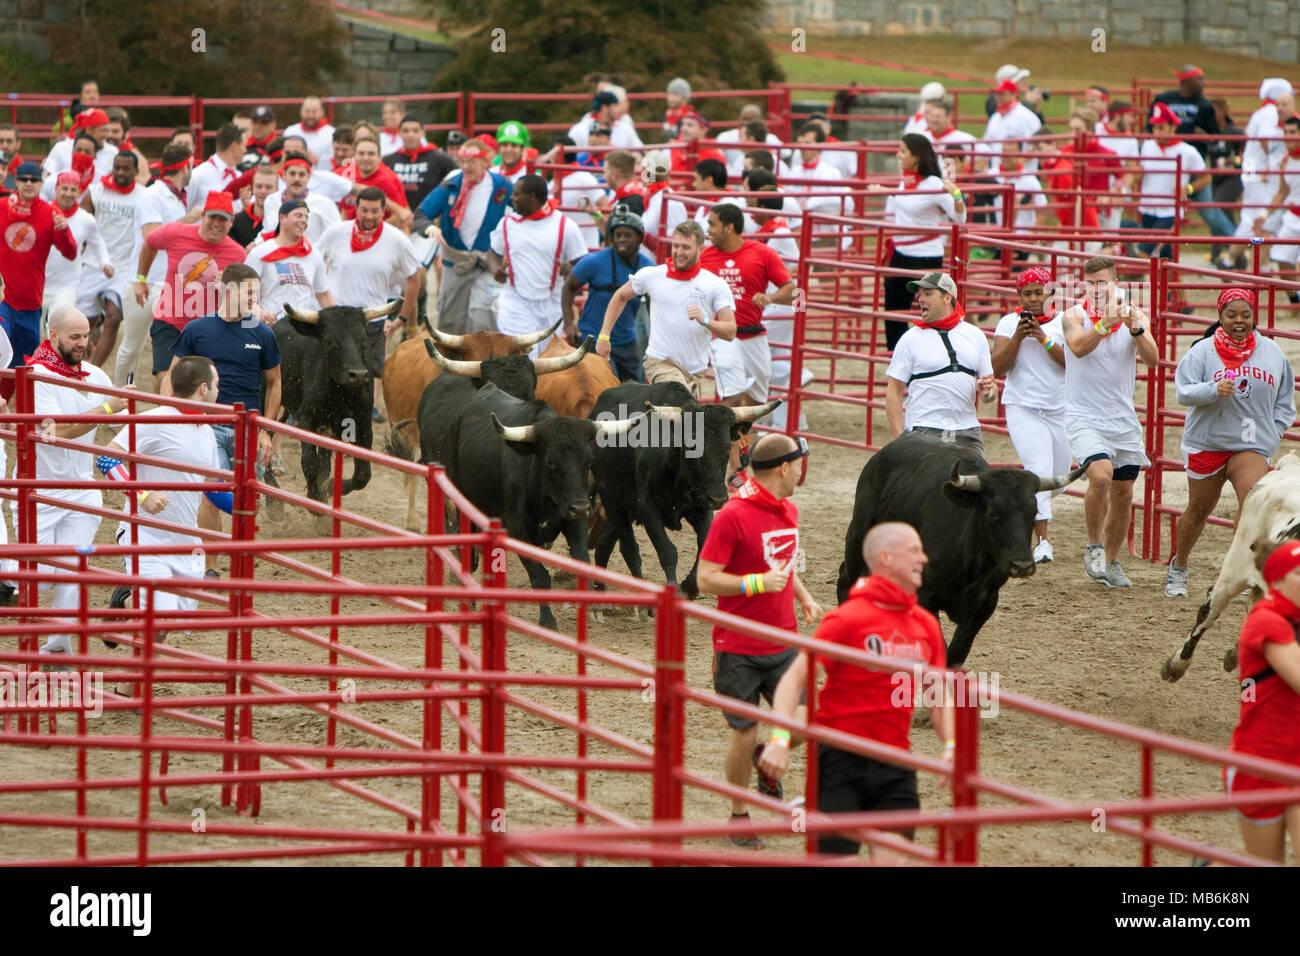 Hunderte von Menschen laufen mit den Bullen am Great Bull Run an der Georgia International Horse Park am 19. Oktober 2013 in Atlanta, GA. Stockbild